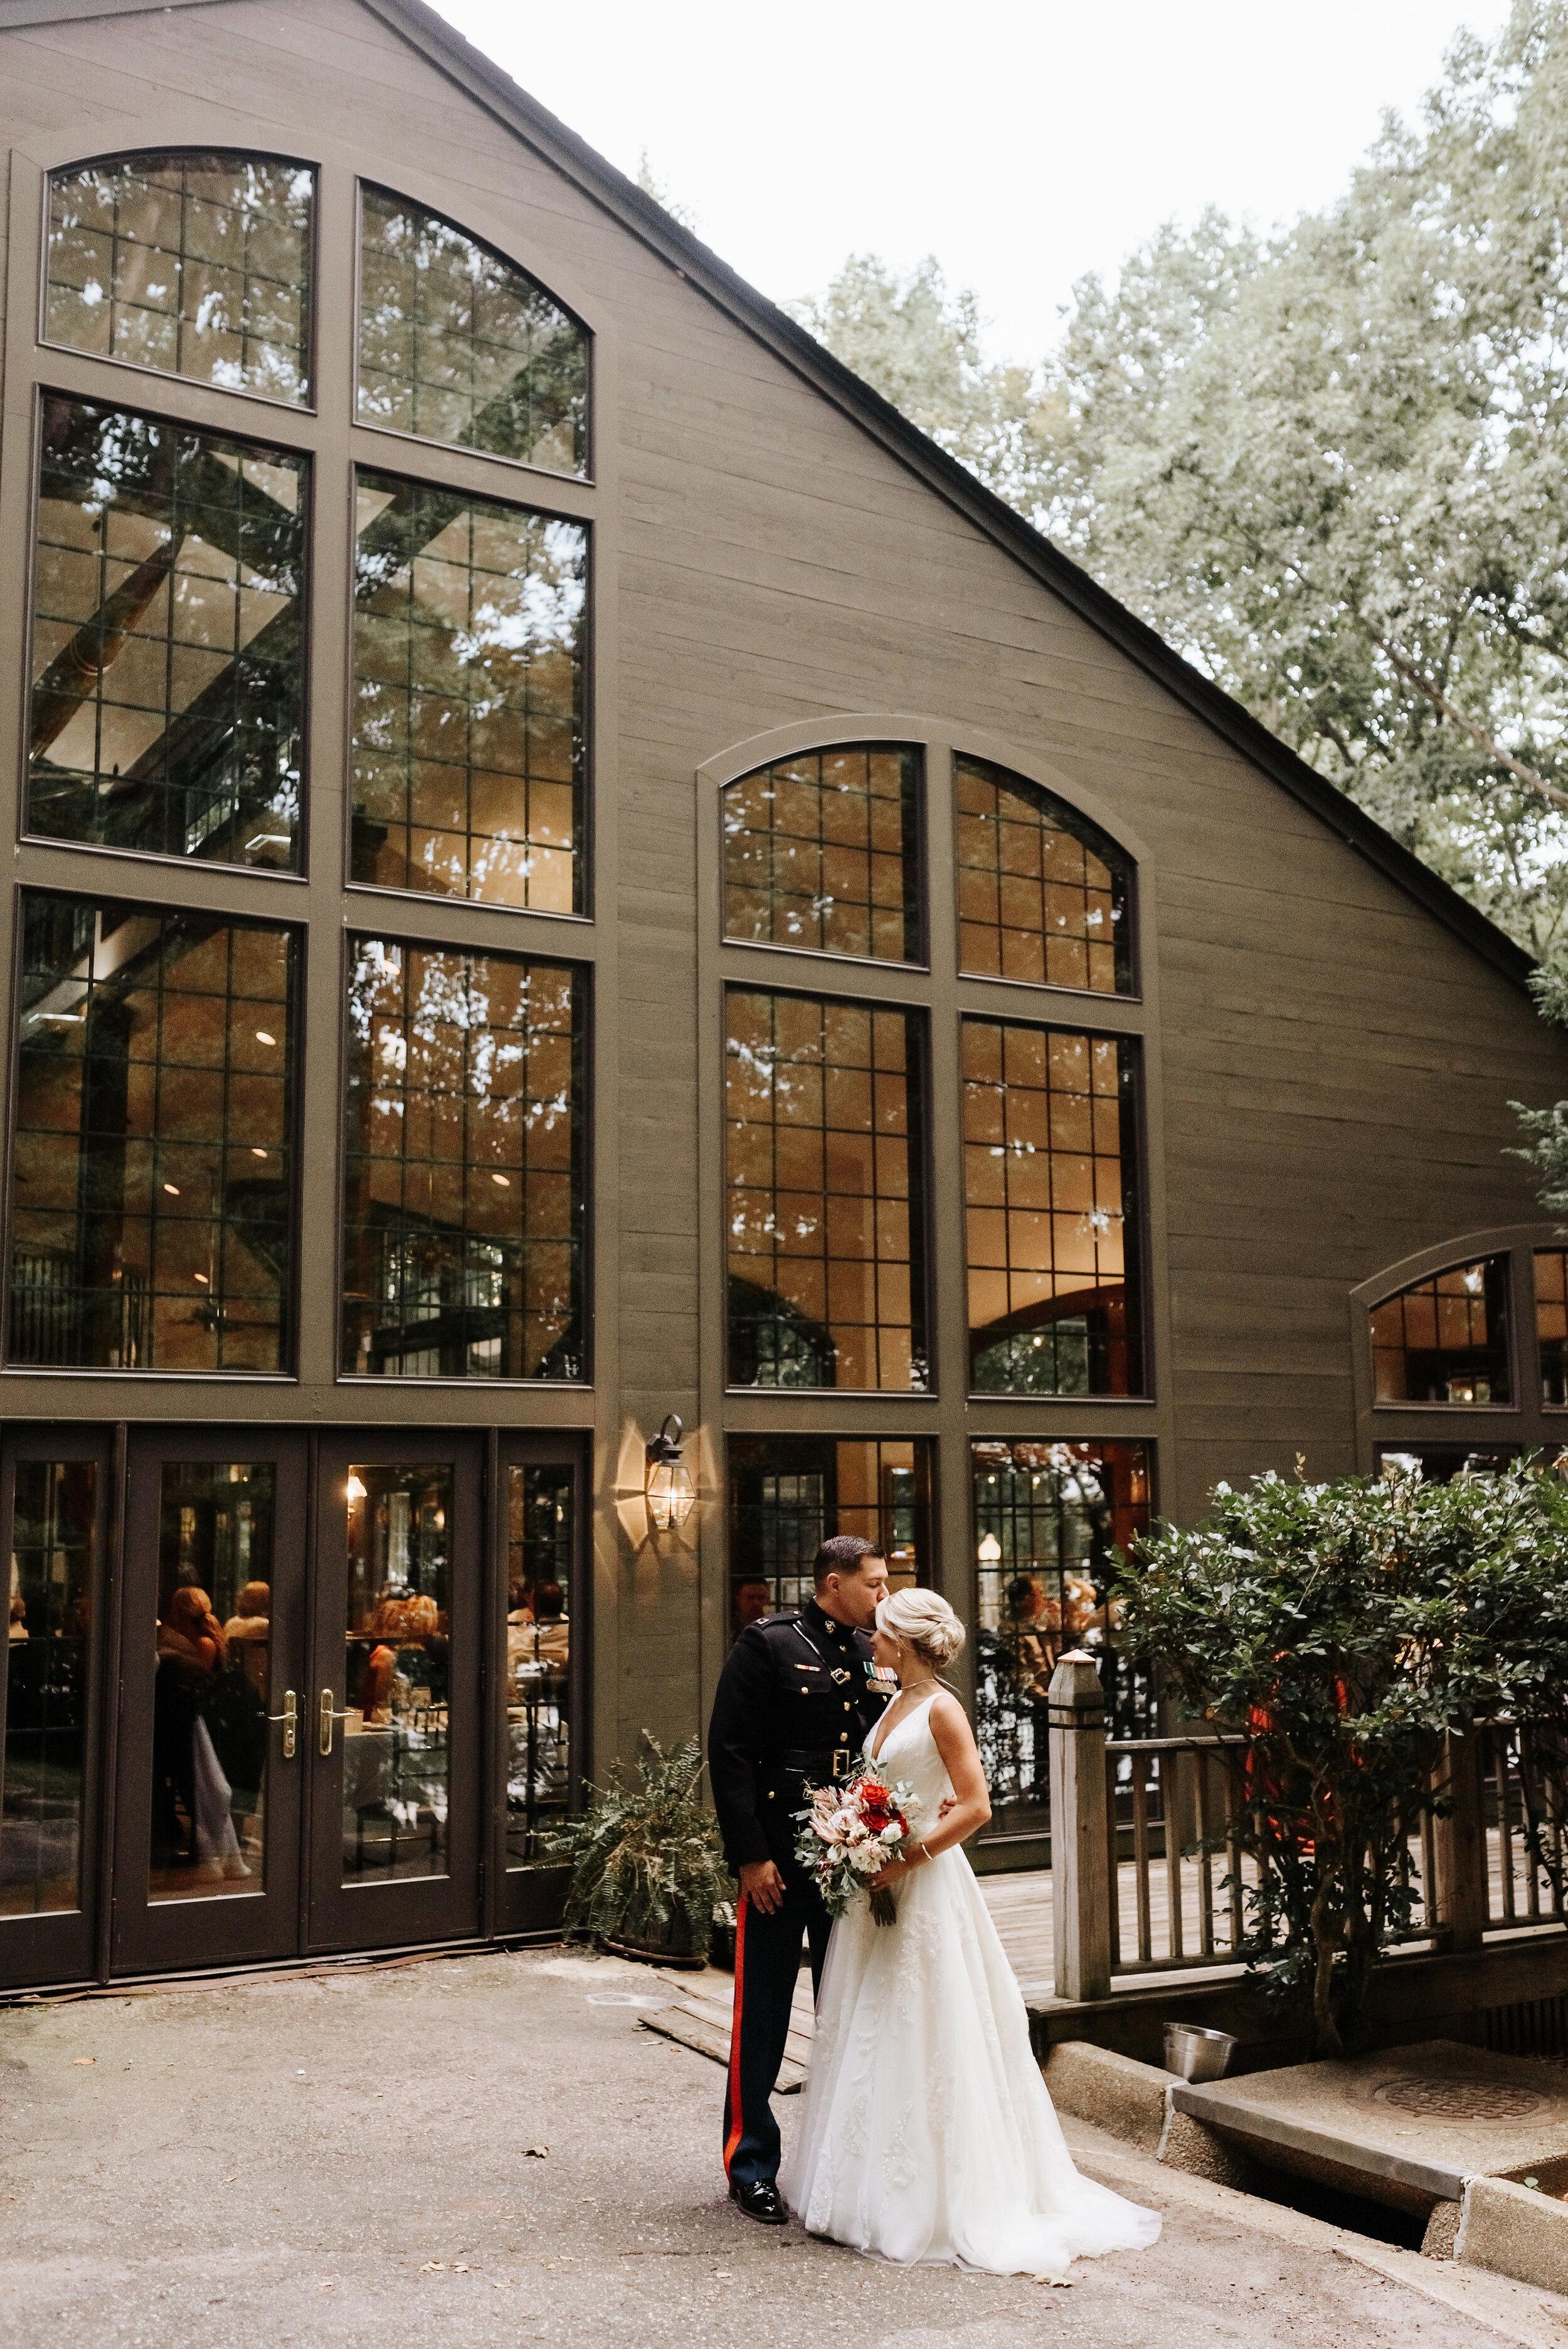 Emily_Mike_Wedding_Celebrations_at_the_Reservoir_Pool_Pavilion_Richmond_Virginia_Wedding_Photographer_Photography_by_V_91.jpg